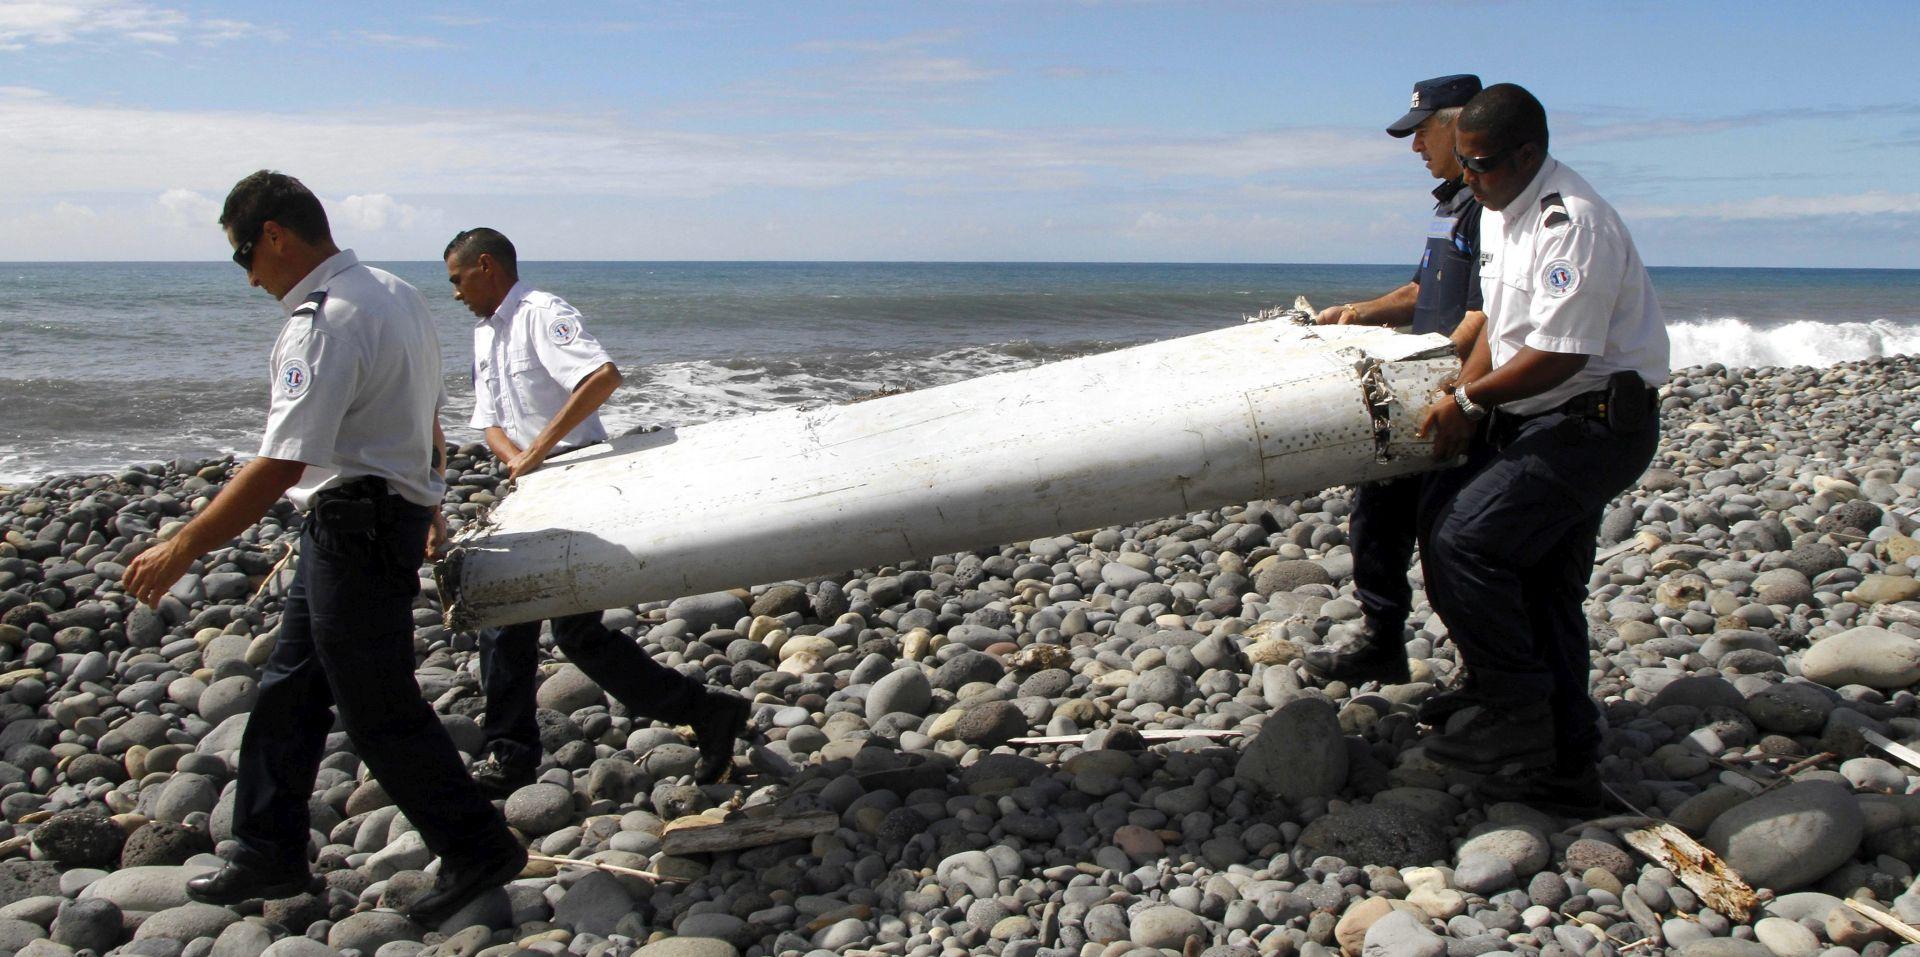 MISTERIJ SE NASTAVLJA: Na Filipinima pronađeni ostaci zrakoplova s mnogobrojnim kosturima, sumnja se na let MH370